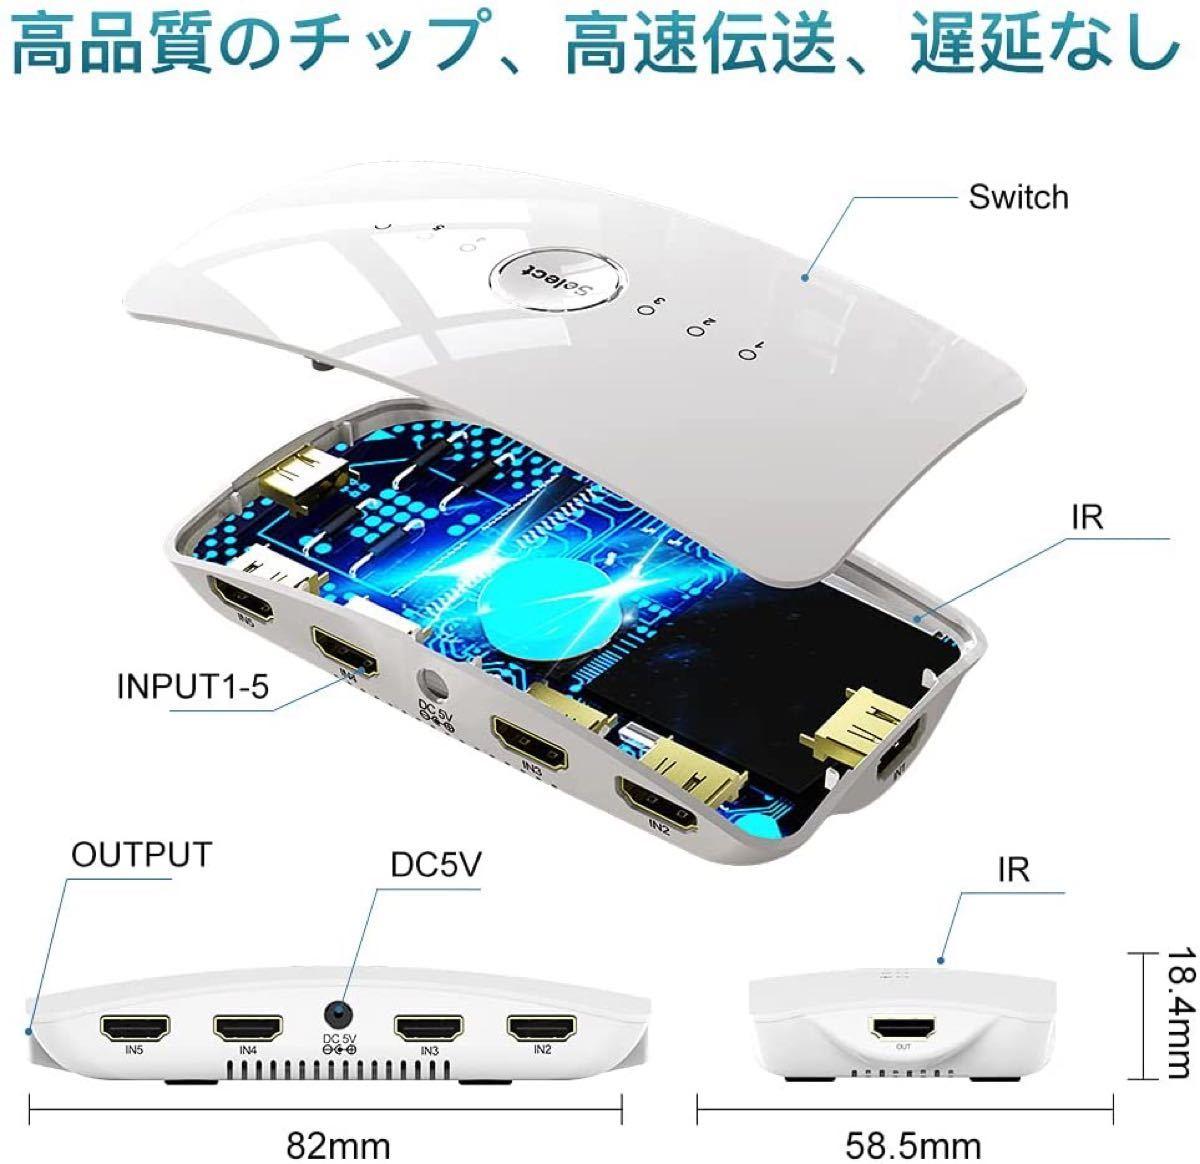 HDMI切替器 自動手動切替機能搭載 5入力1出力 HDMI分配器